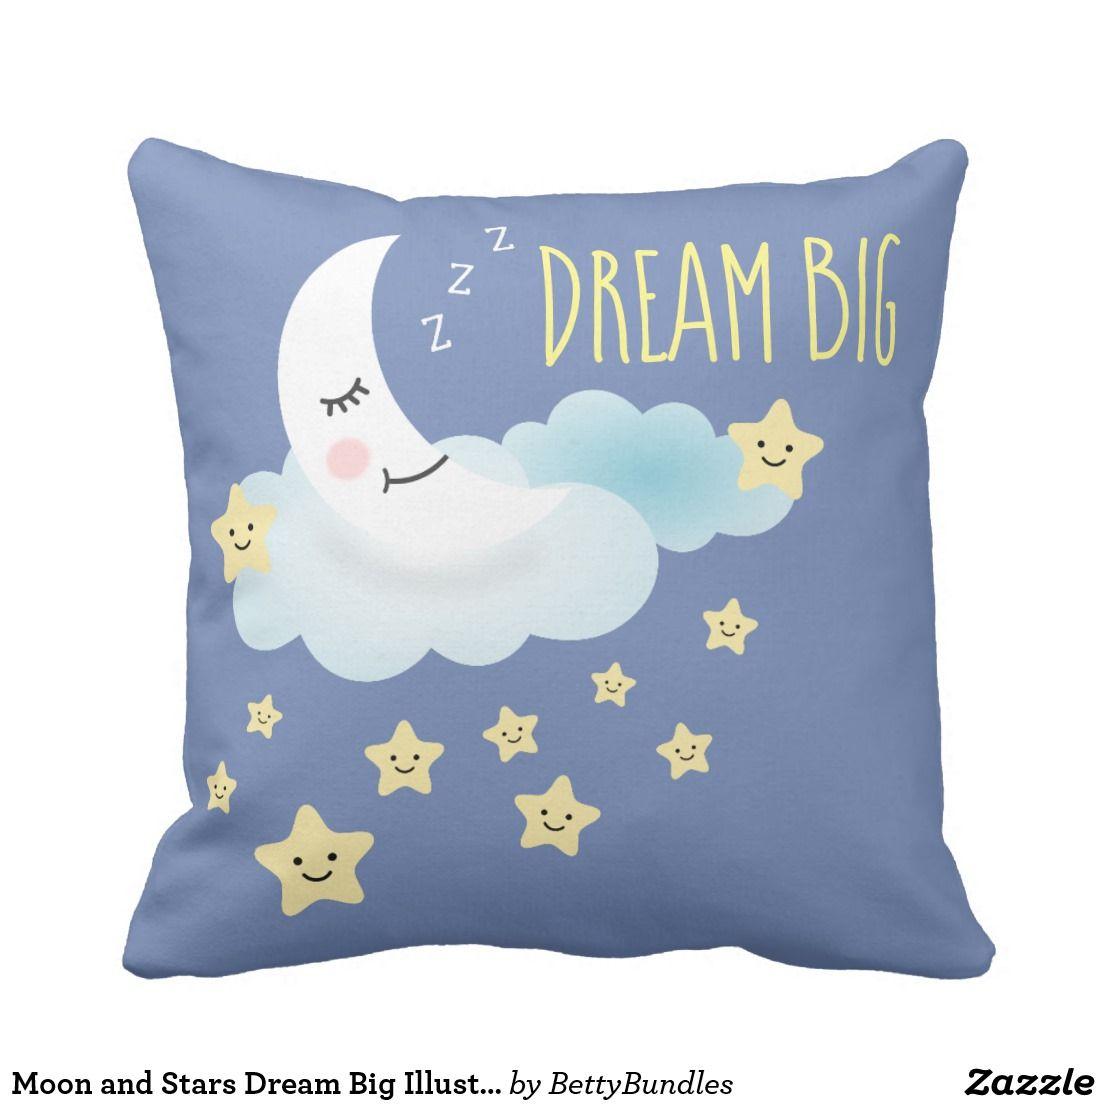 Moon and stars dream big illustration throw pillow